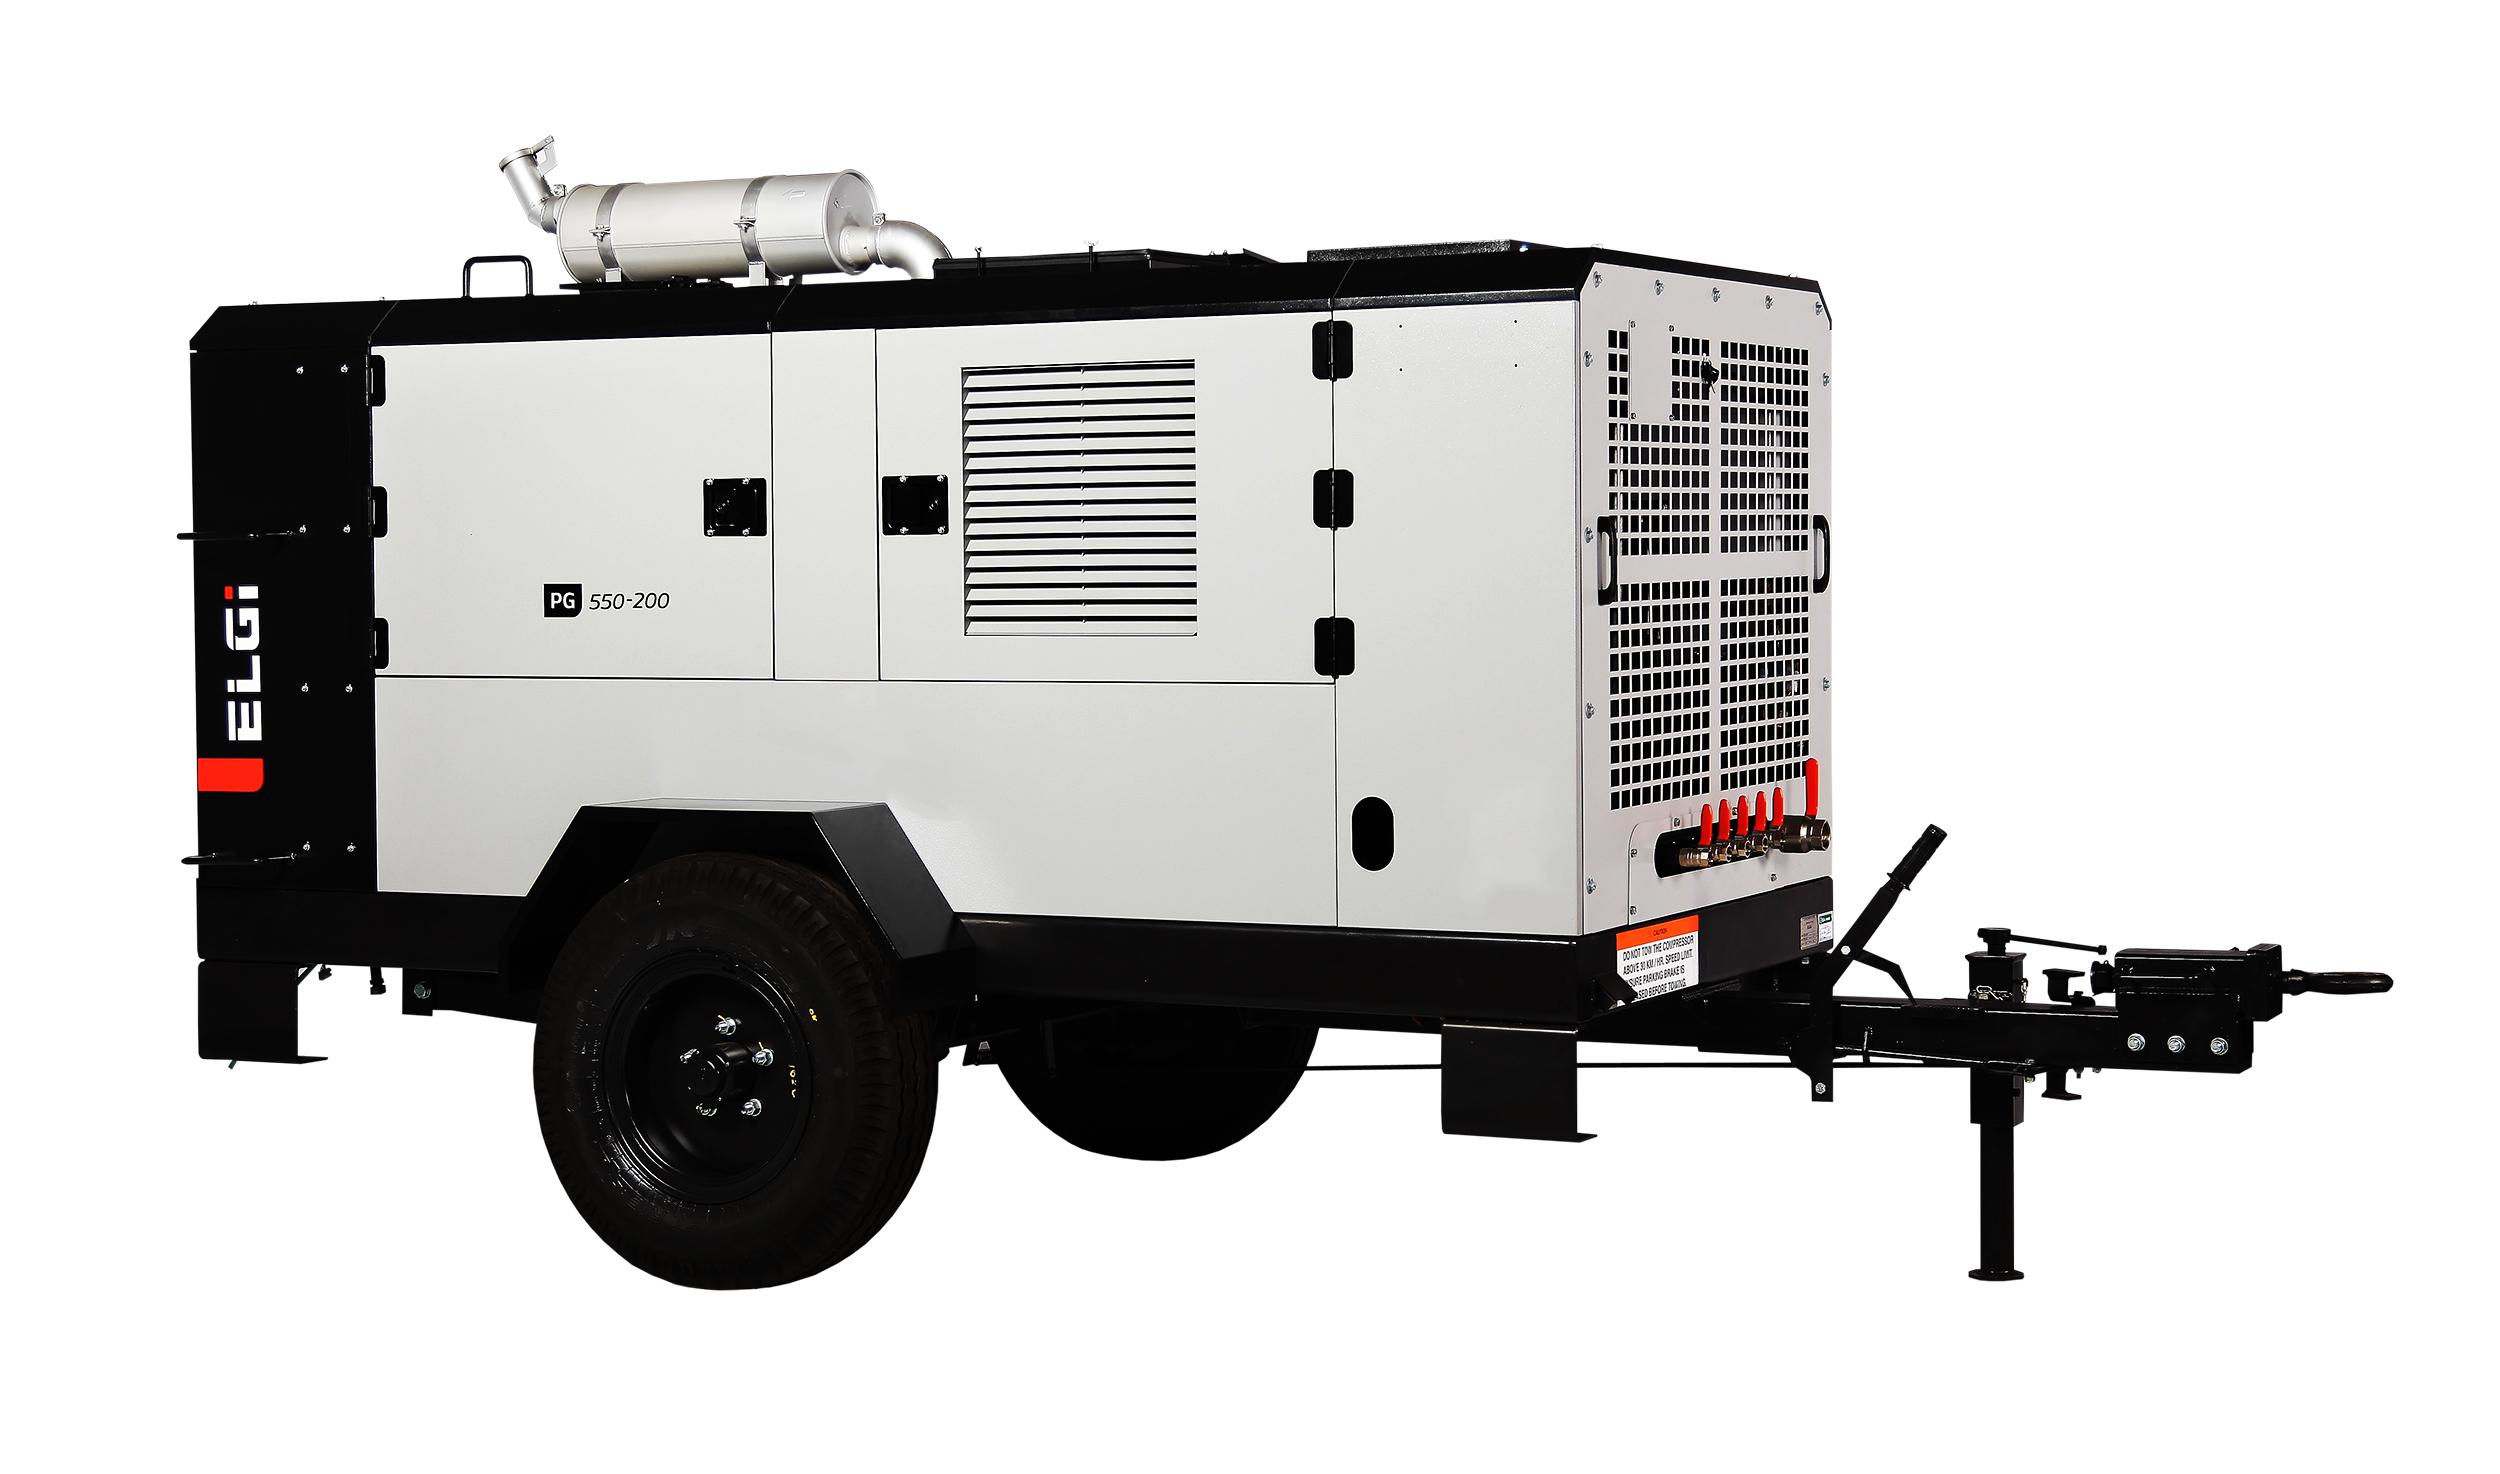 PG 550 - 200